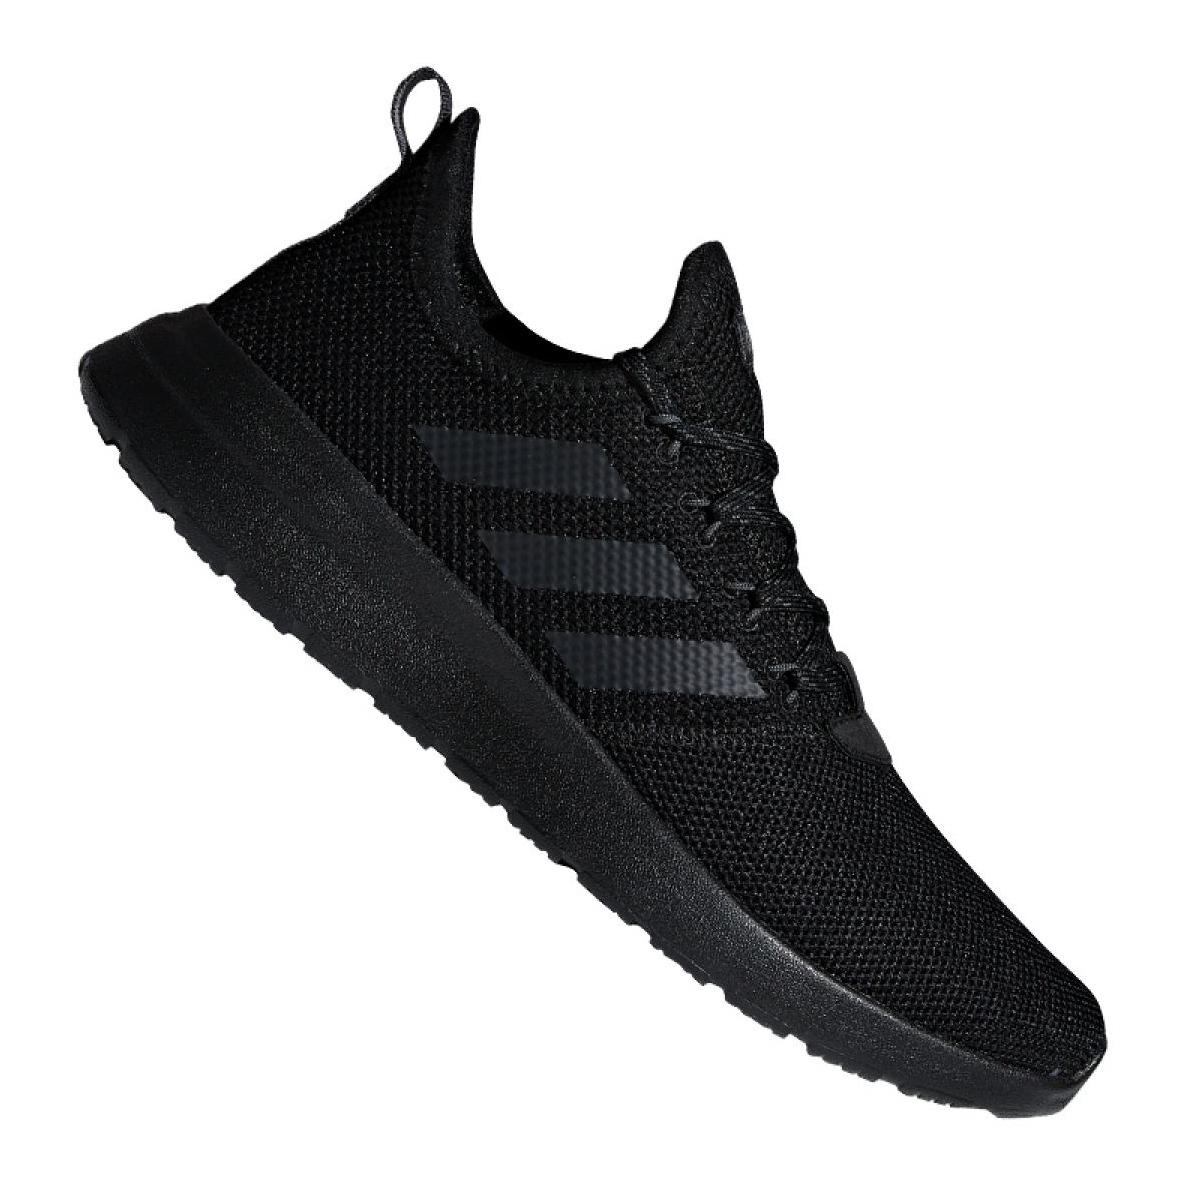 online store 6b401 10388 Black Running shoes adidas Cloudfoam Lite Racer Reborn M F36642